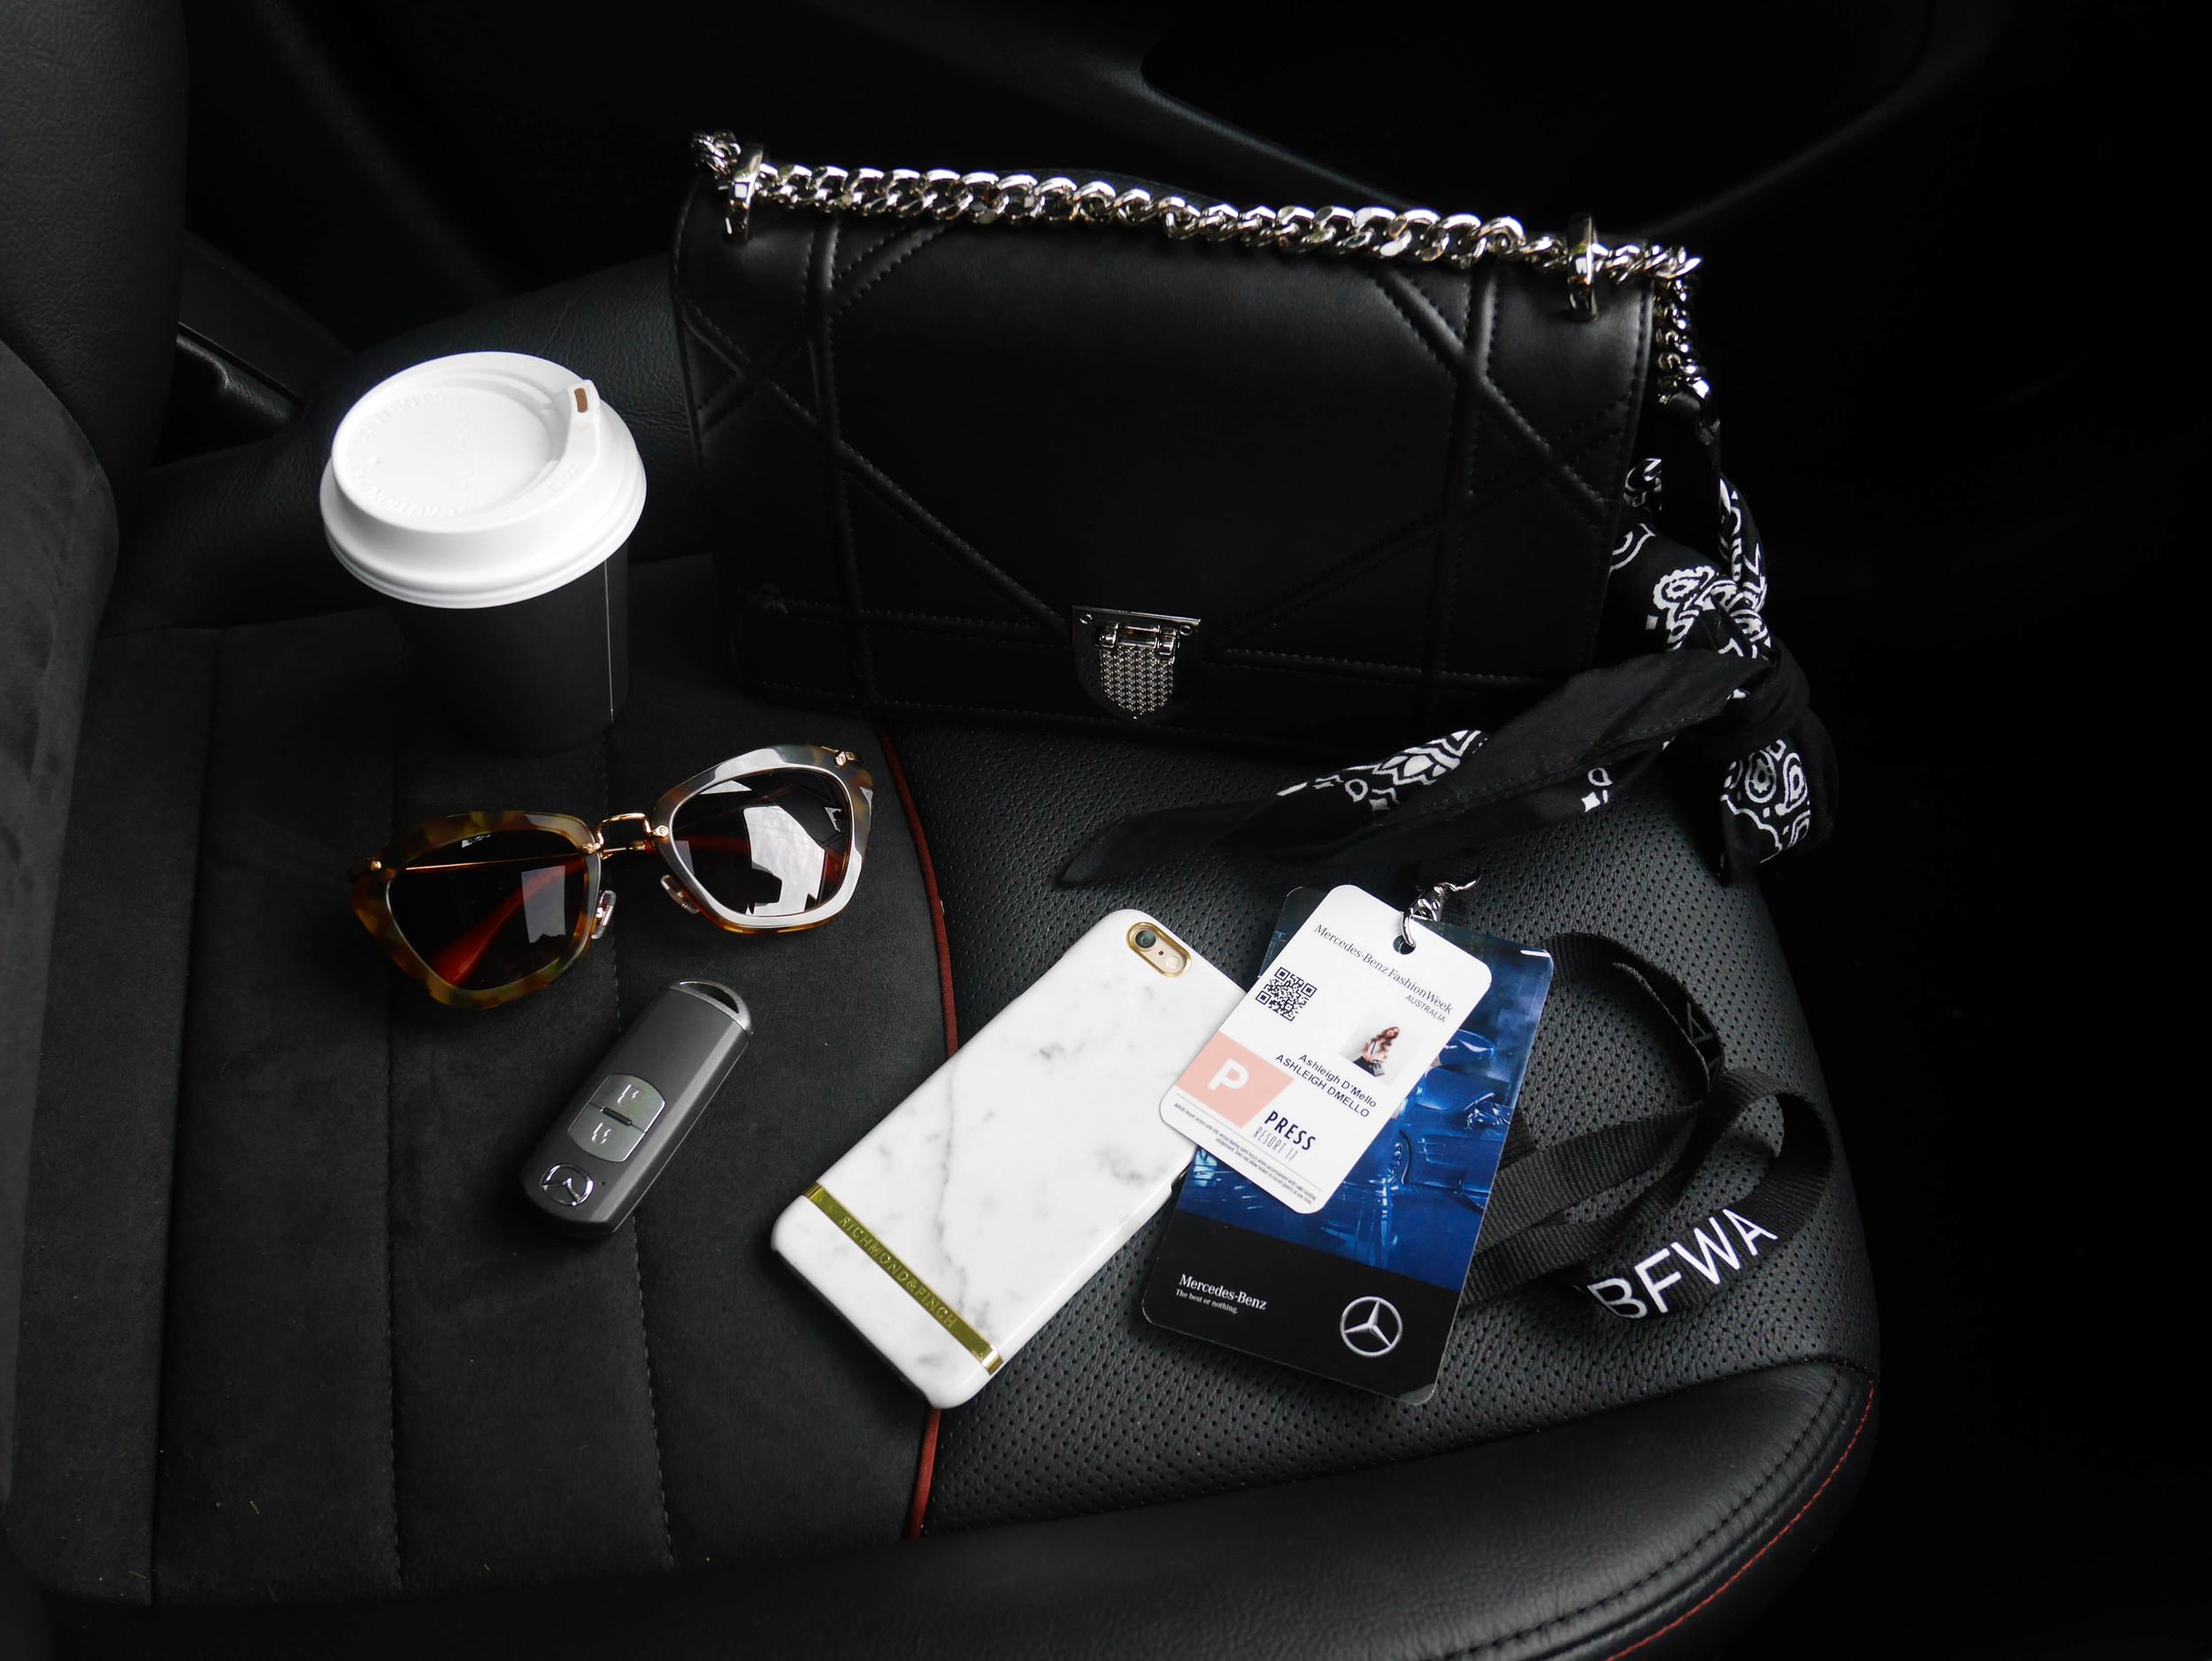 On the go essentials - featuring Miu Miu sunglasses from Sunglass Hut and the Mazda CX3